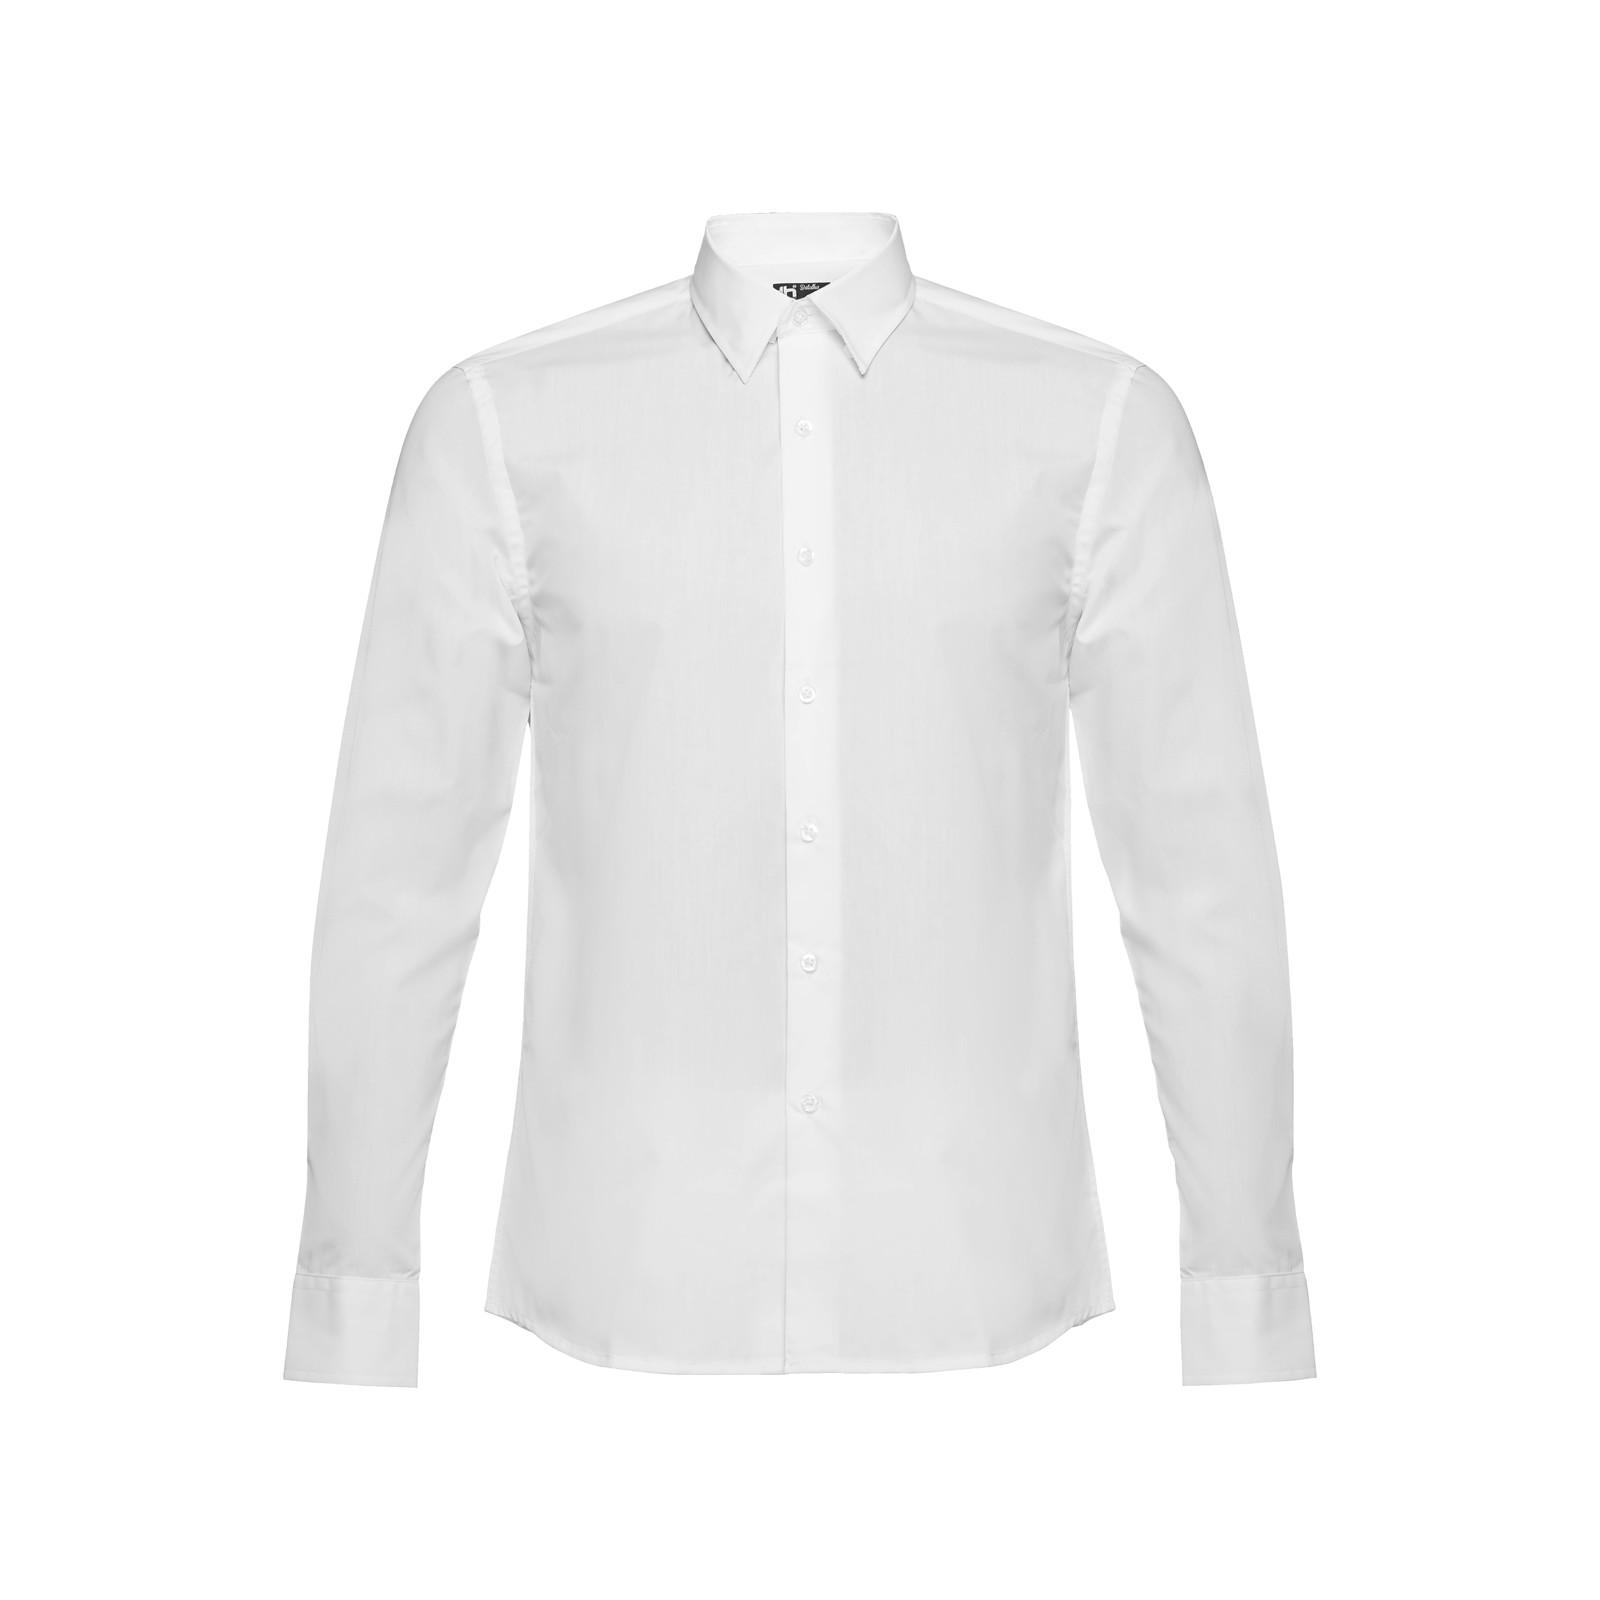 THC BATALHA WH. Pánská popelínová košile - Bílá / S